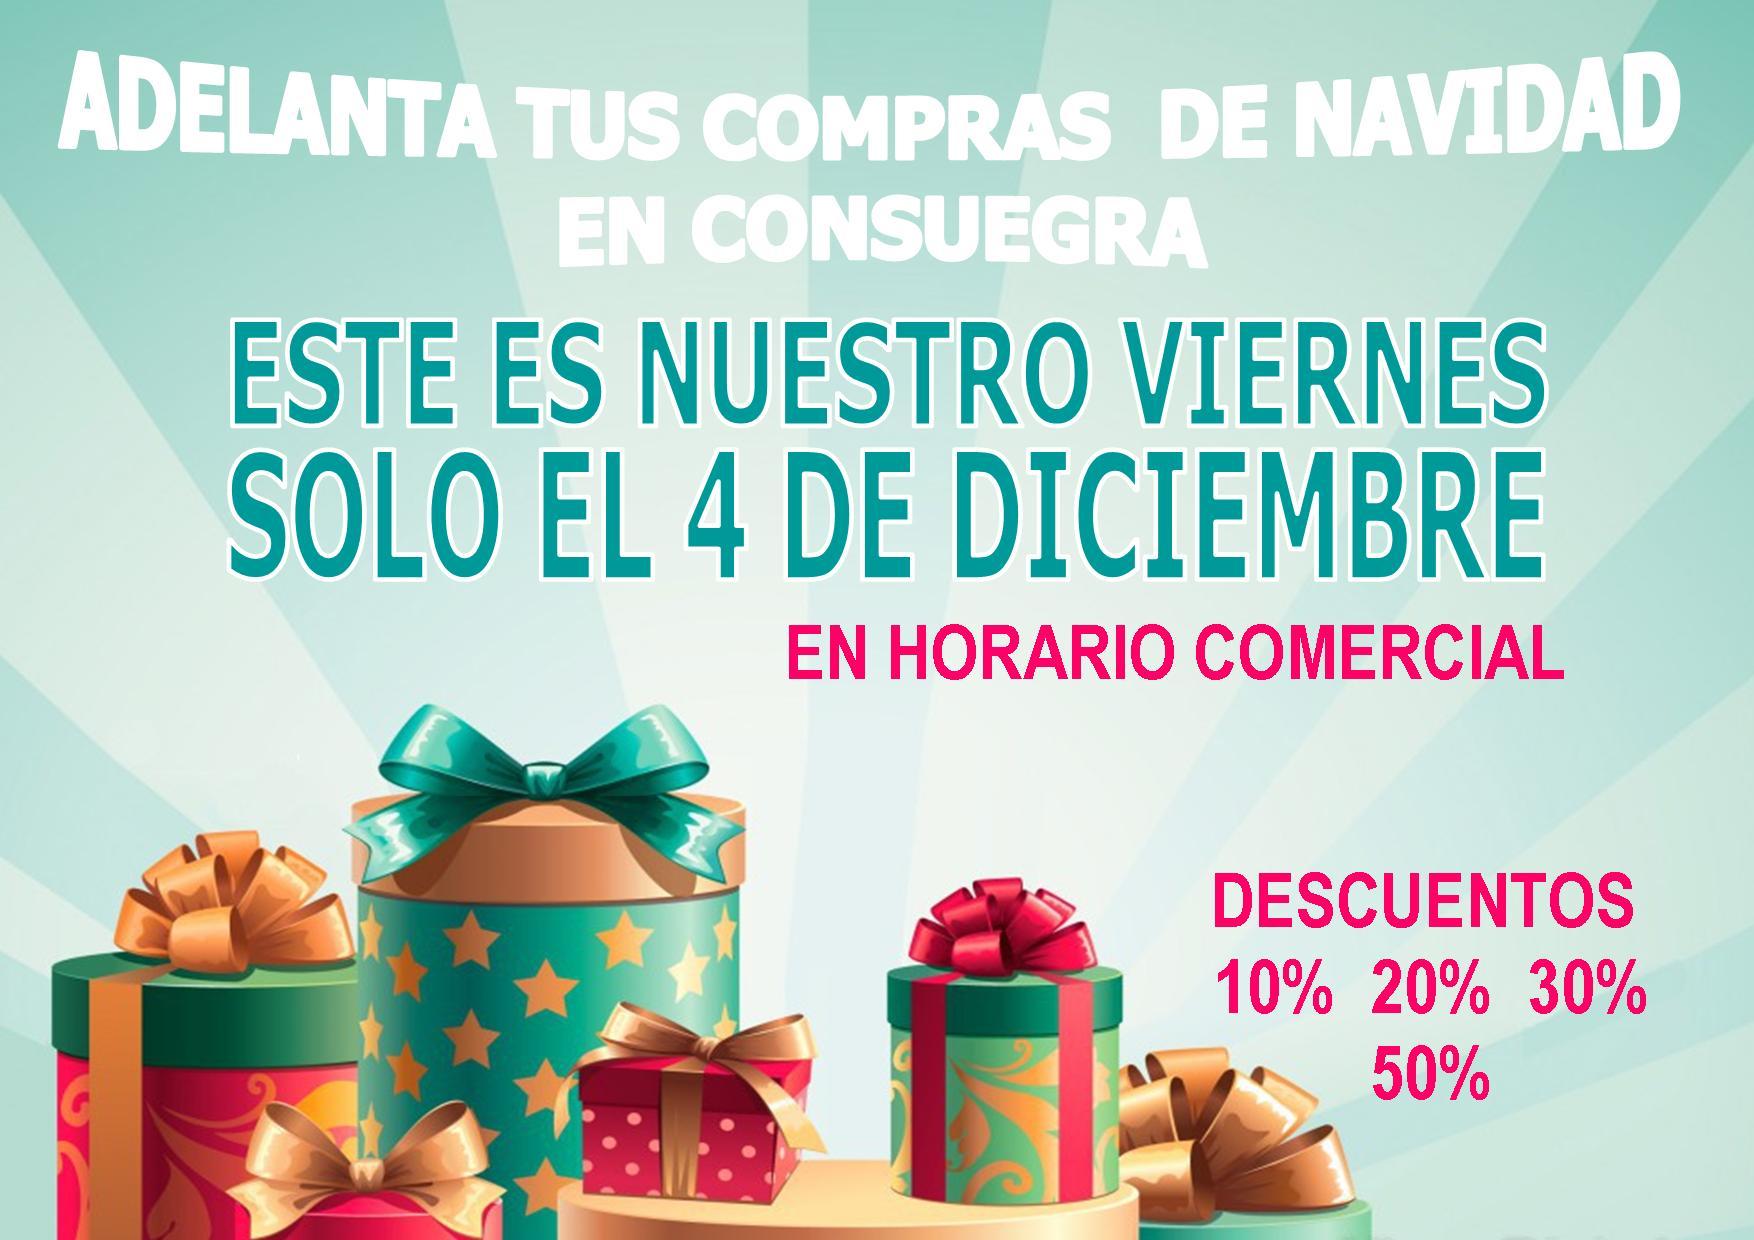 compras-navideas2015-rec1.jpg - 195.05 KB